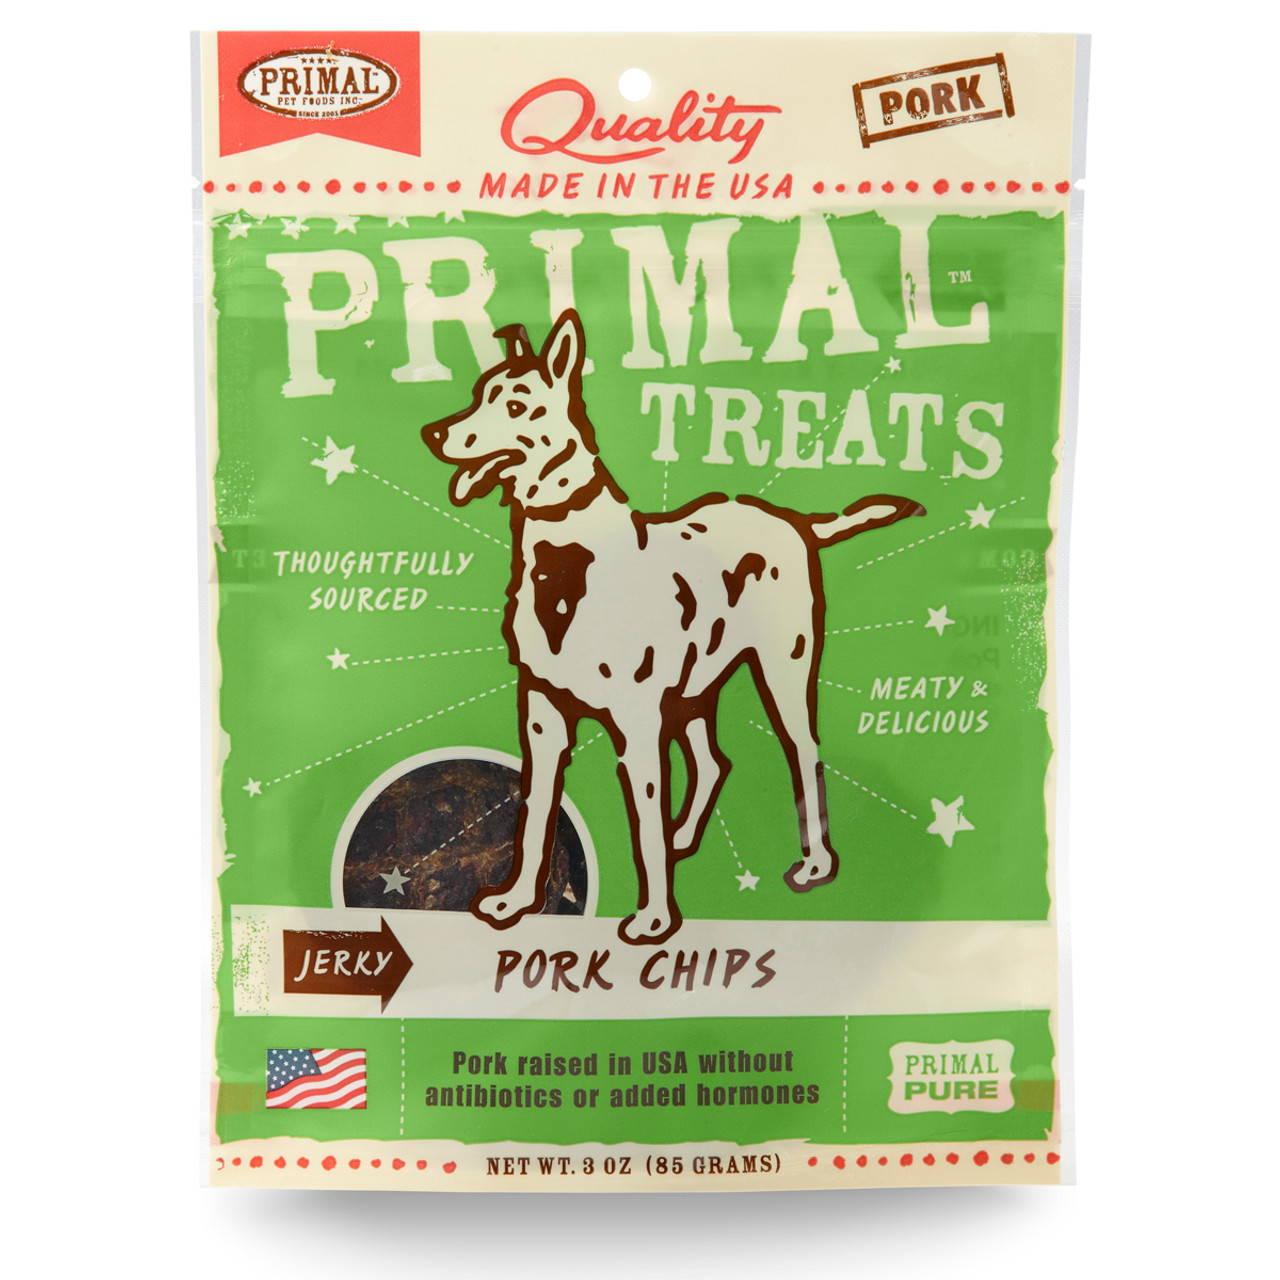 Primal Jerky Pork Chips Dog Treats